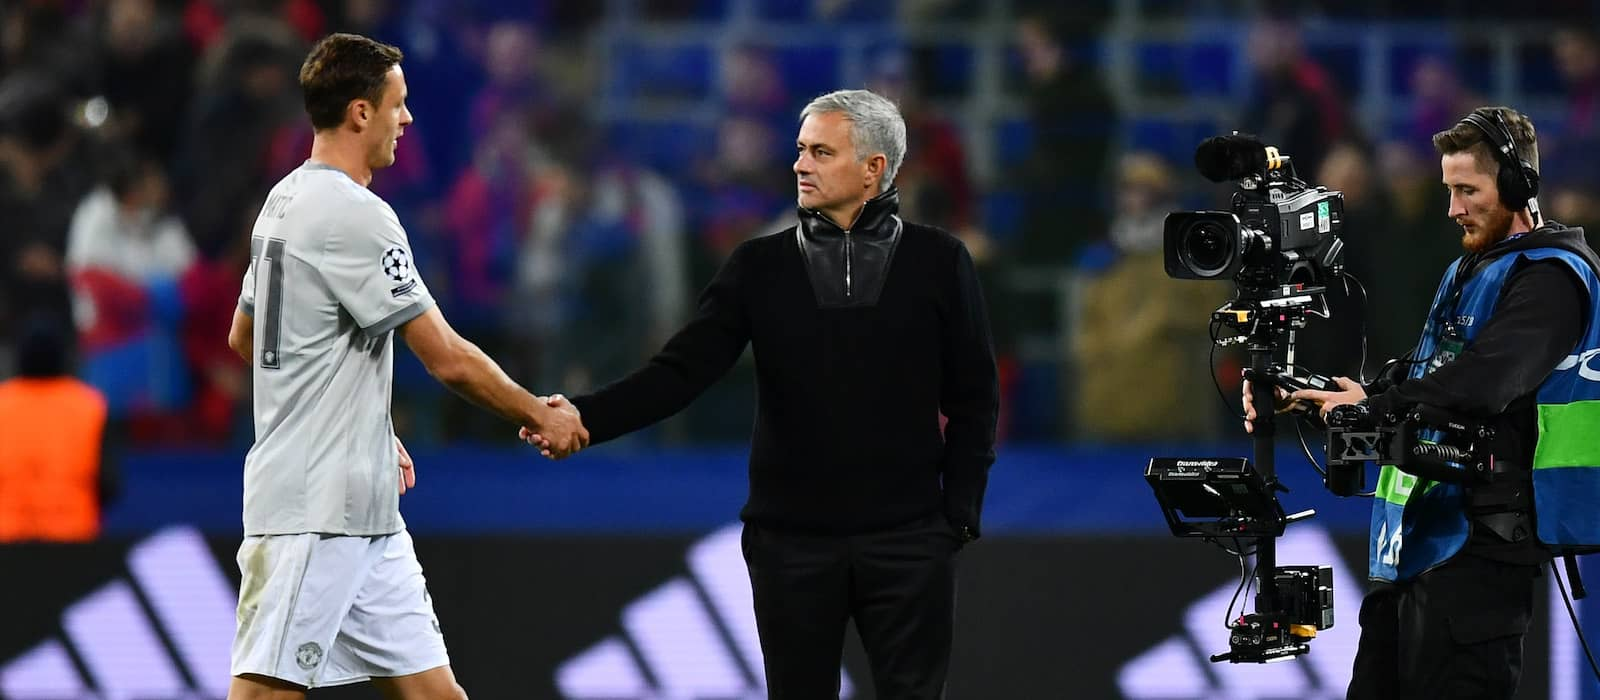 L'Equipe: Zinedine Zidane keen to replace Jose Mourinho at Manchester United